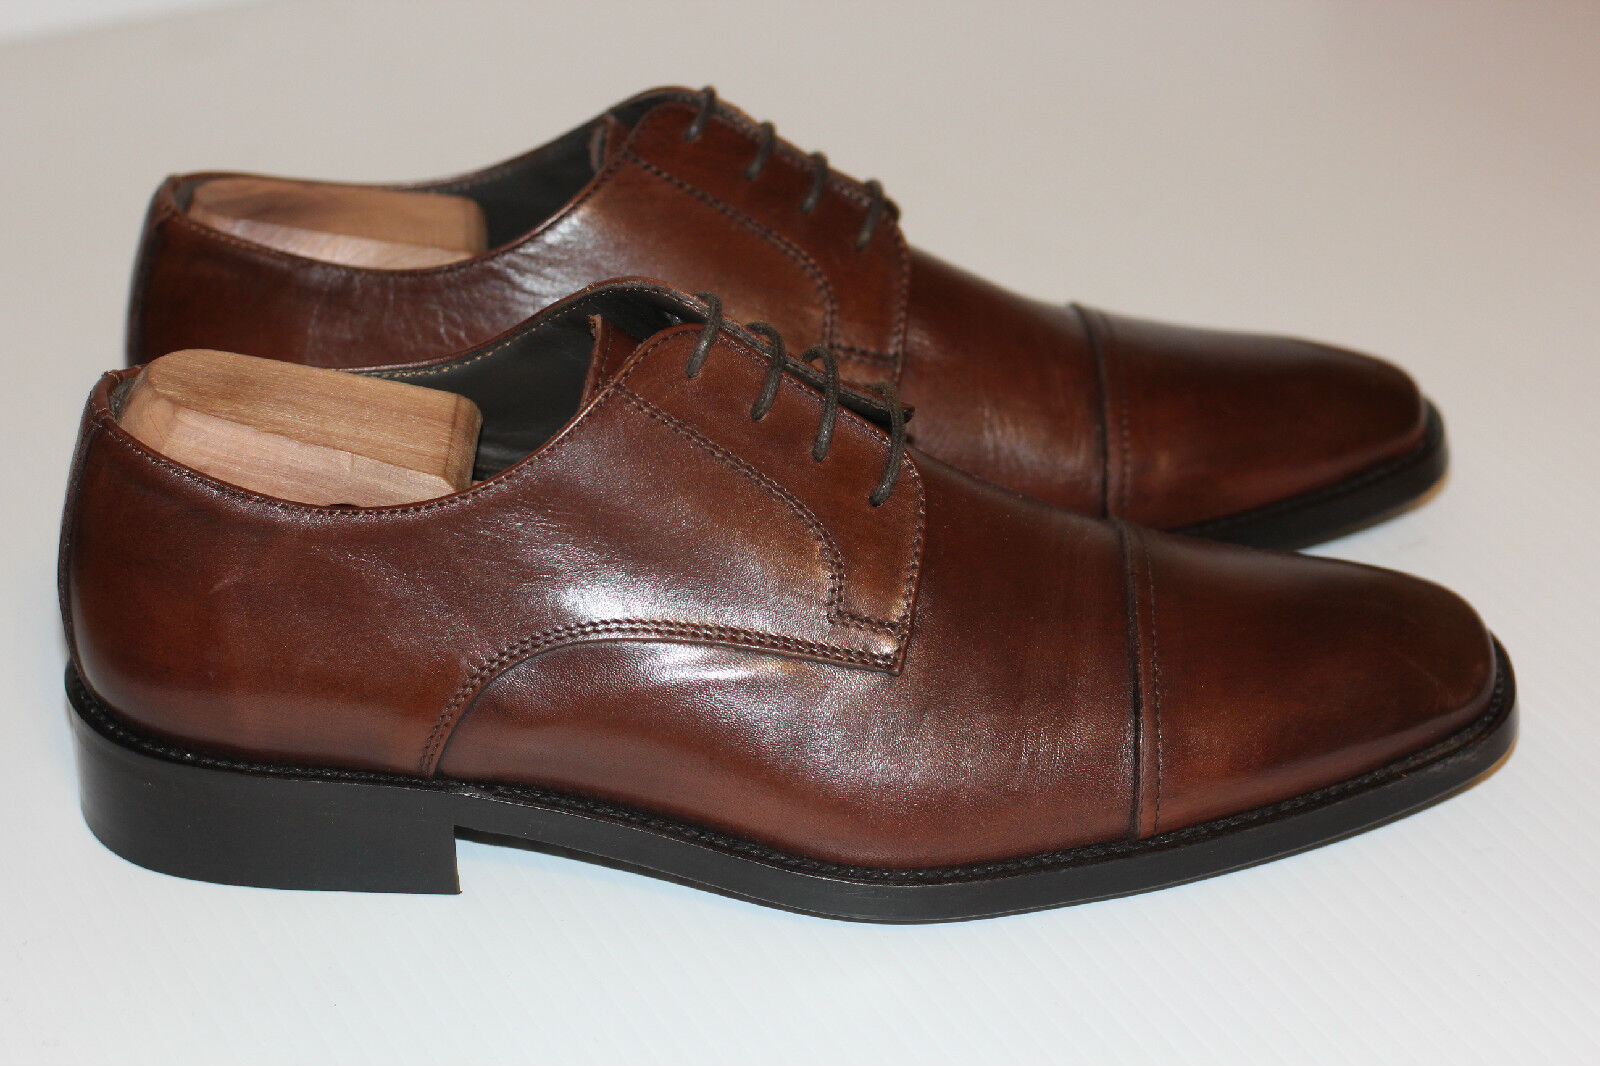 NEW To avvio New York 'Maxwell' Cap Toe Derby Oxford - Marronee Leather - 9.5 (W56)